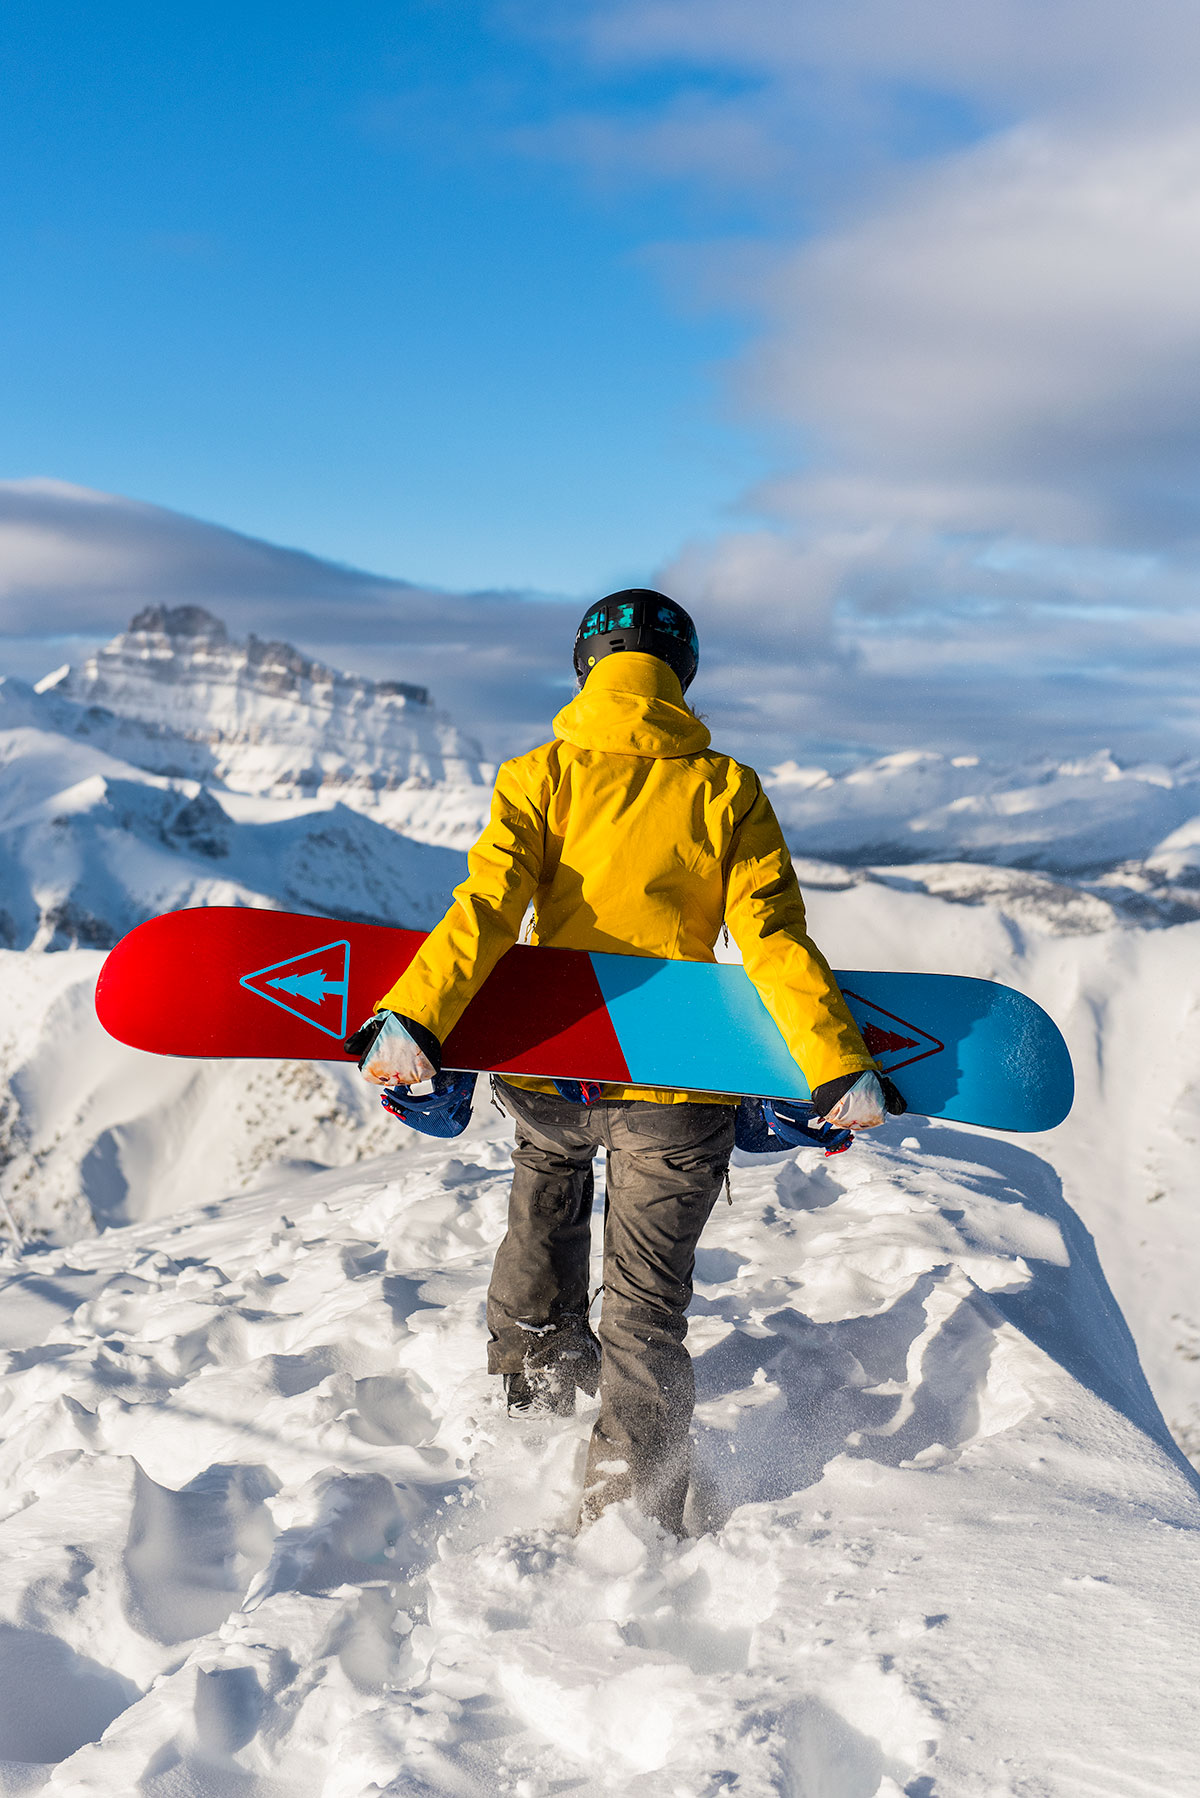 austin-trigg-patagonia-banff-alberta-winter-canada-lifestyle-adventure-mountains-lake-louise-boot-pack-adventure.jpg